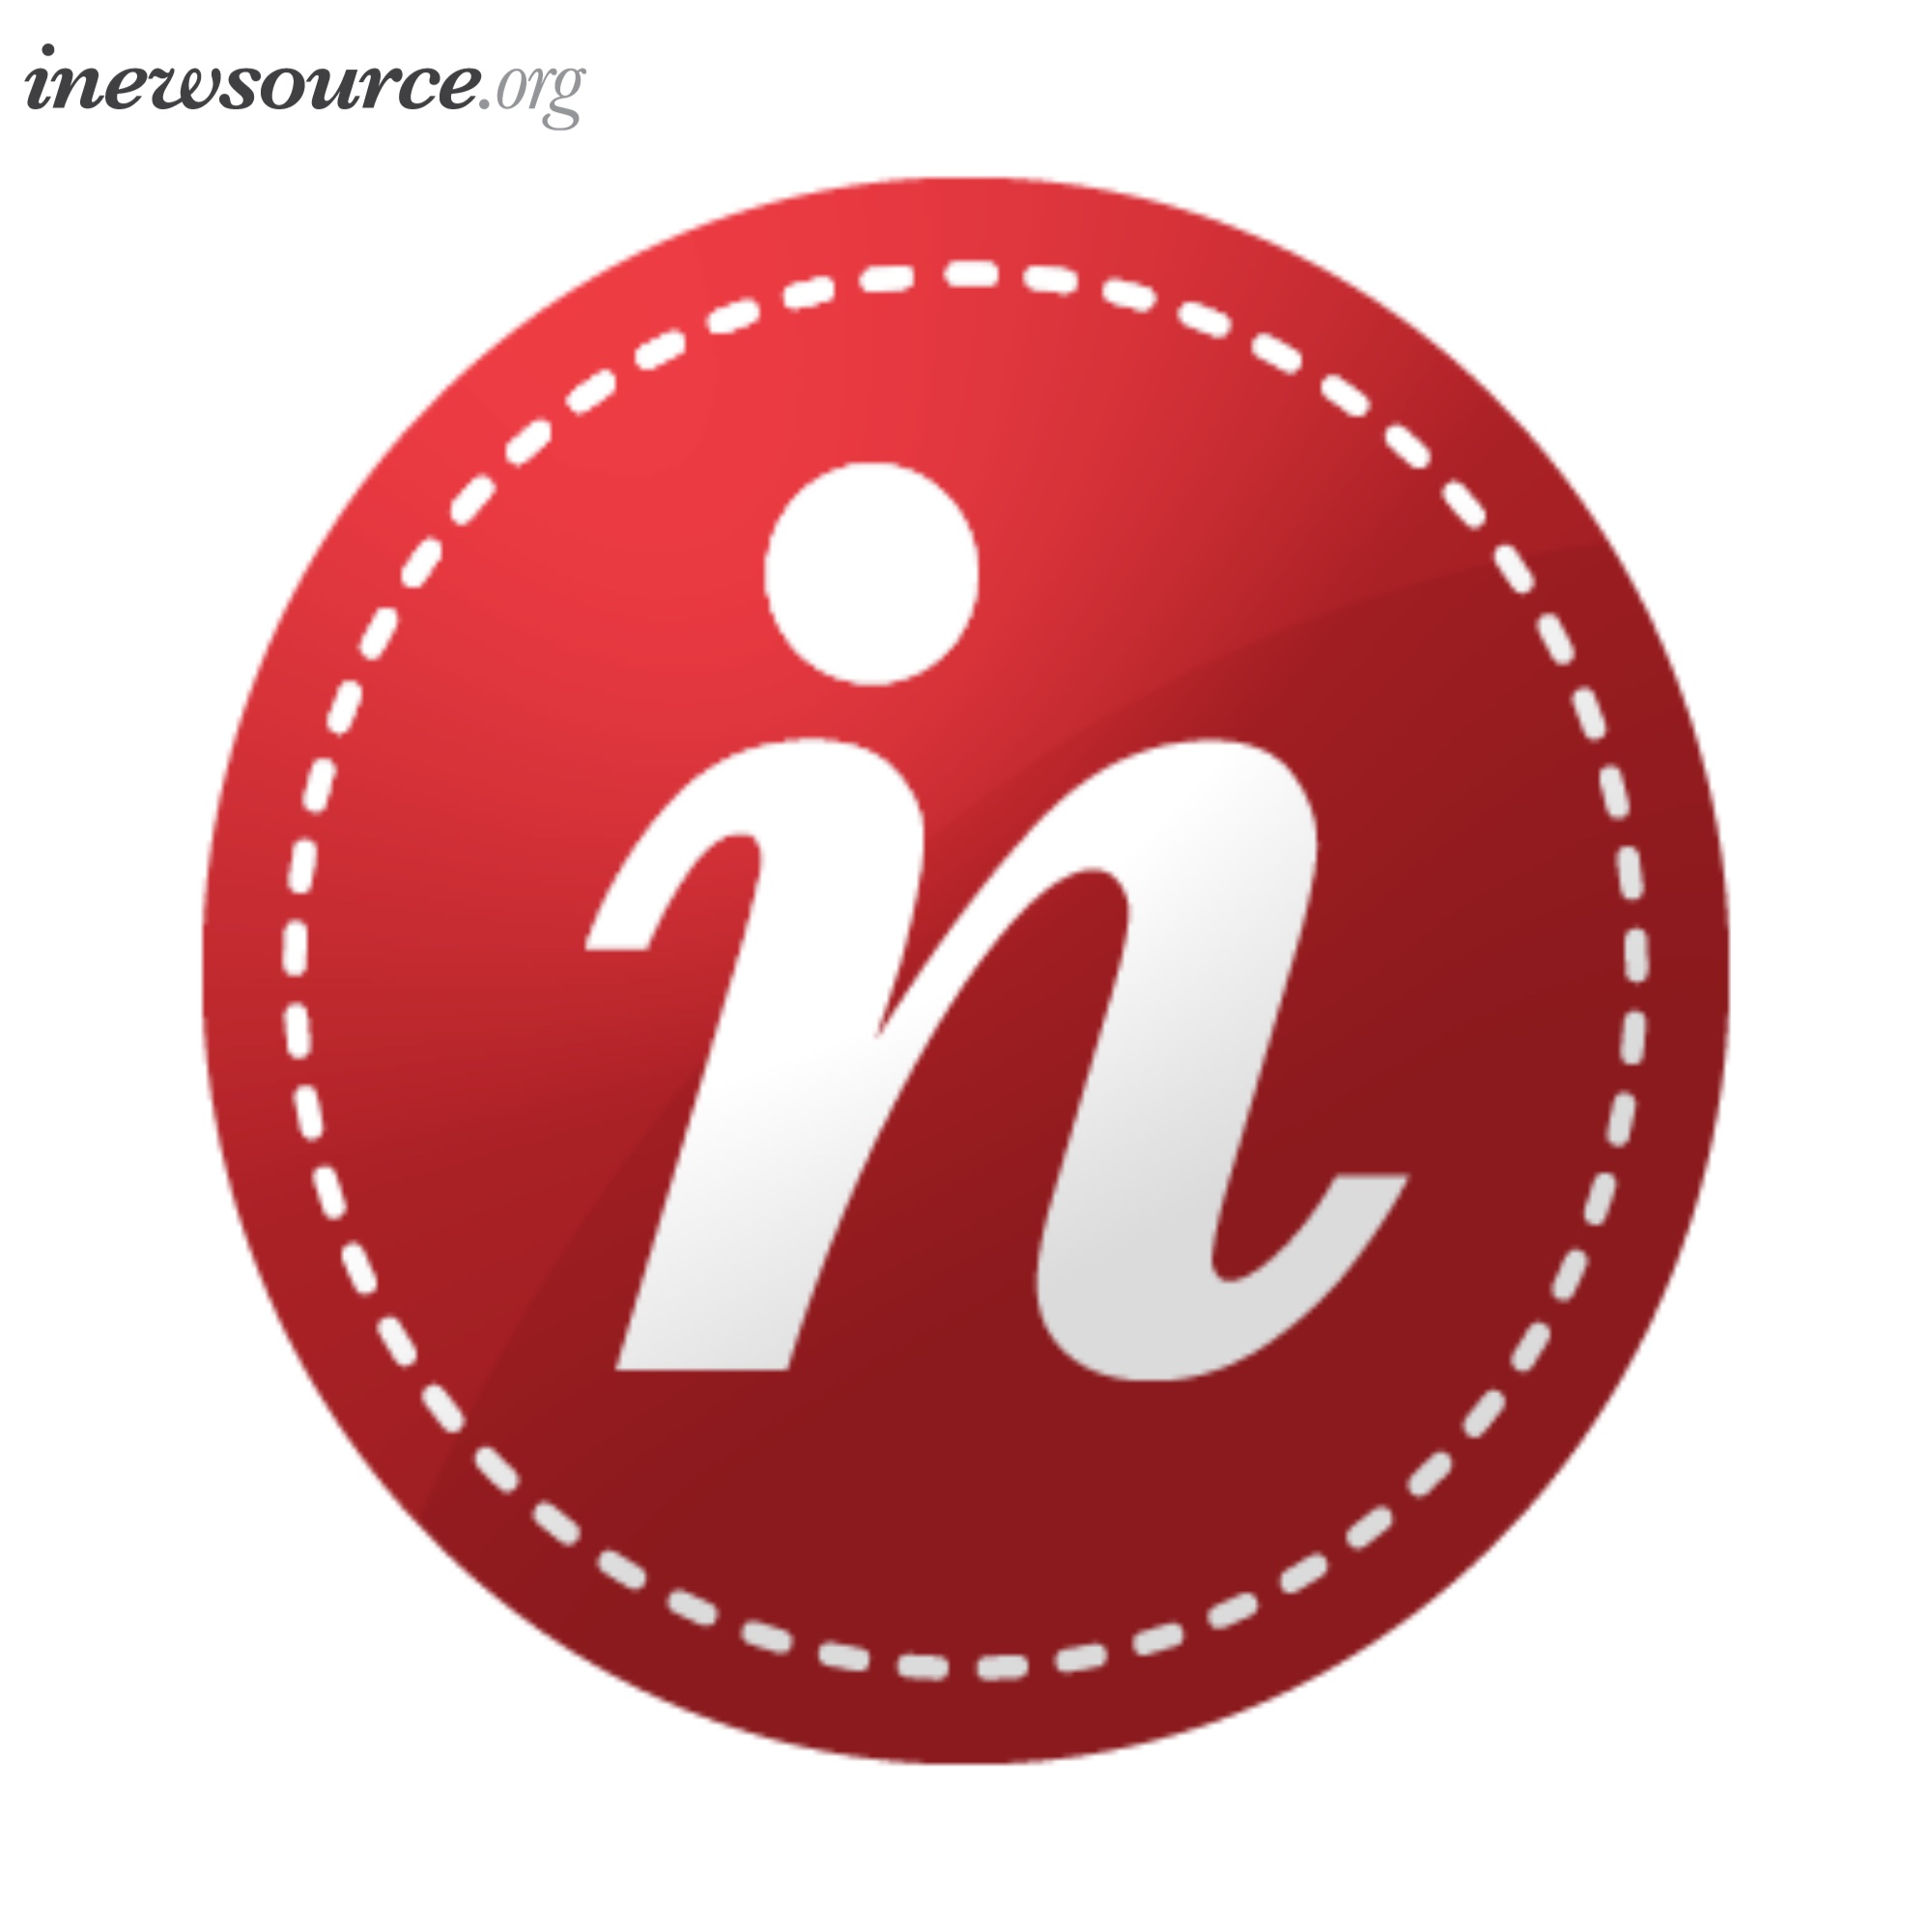 inewsource